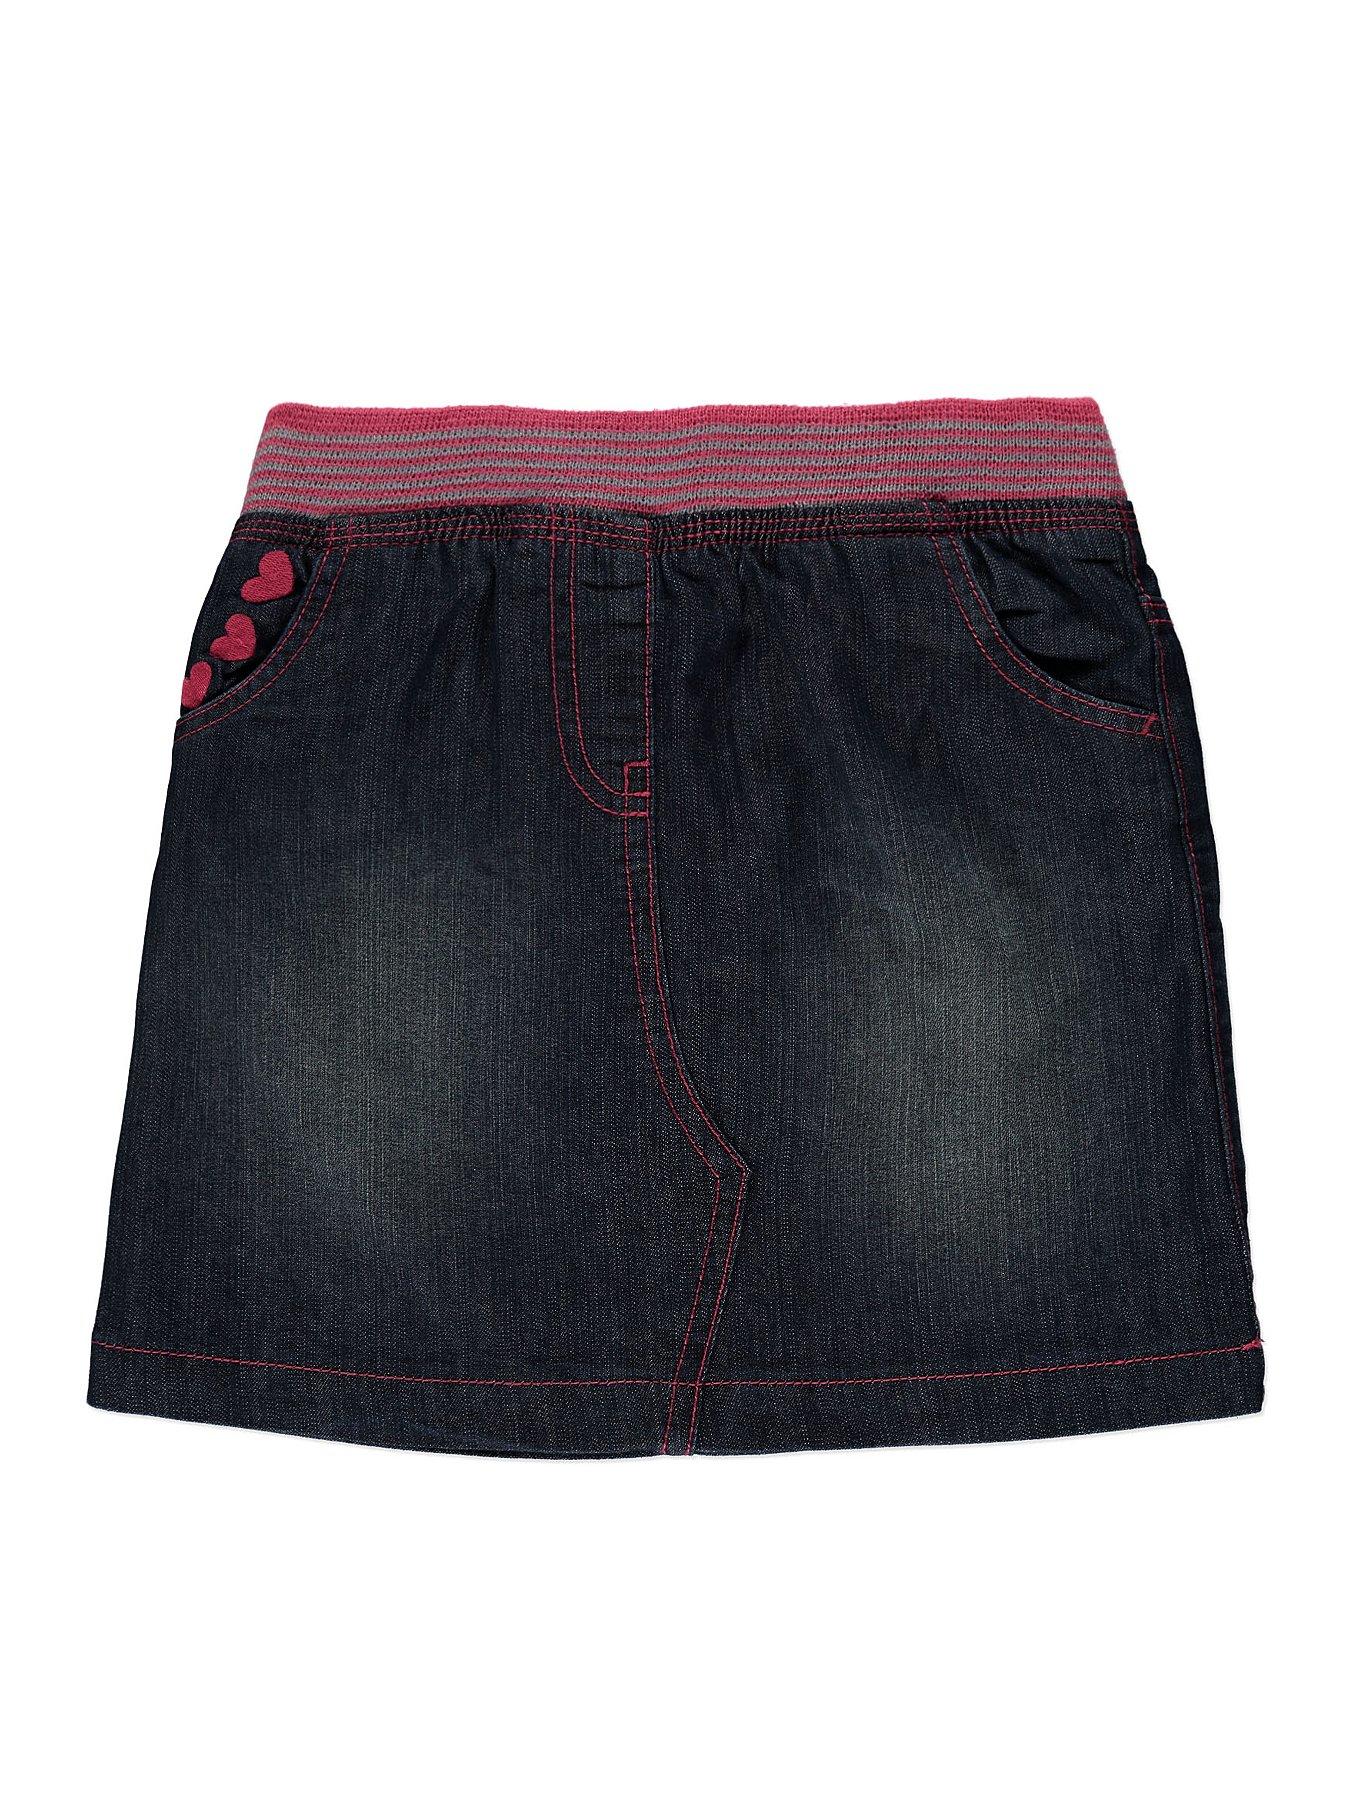 Miss Me Womens Embroidered Denim Skirt